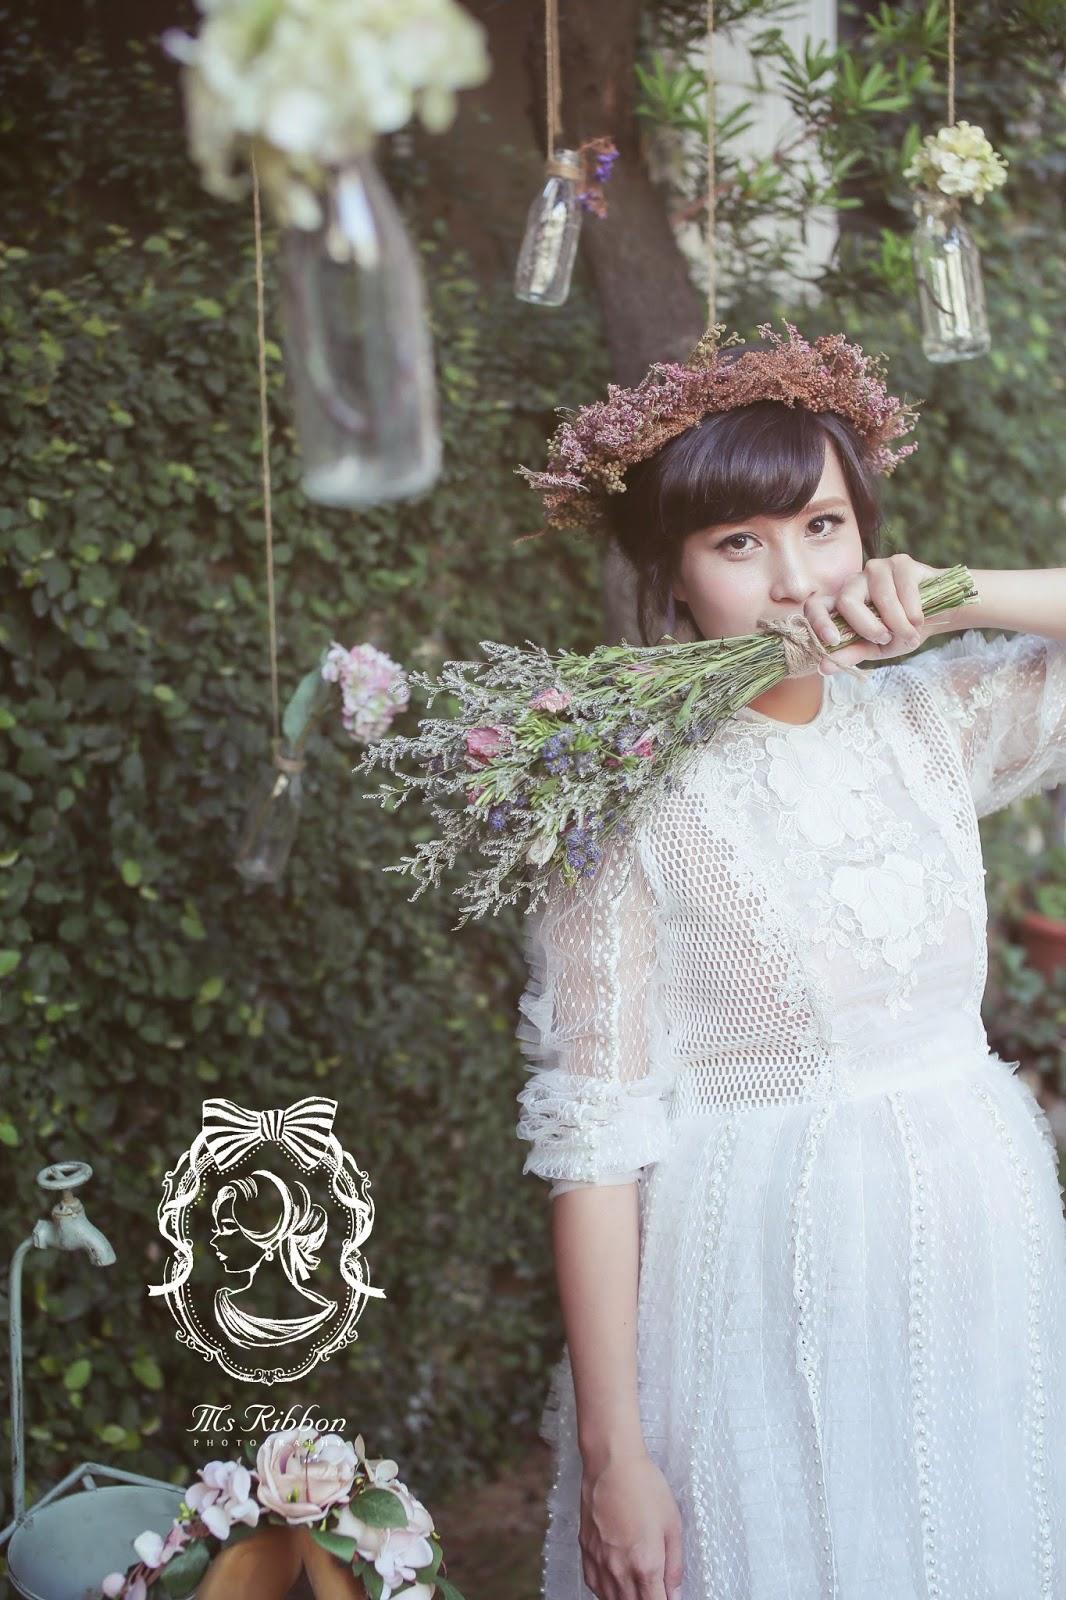 Ms.Ribbon 芮本小姐 孕女孩-安妮寫真 古典婚紗攝影 | Ms.Ribbon 芮本小姐婚紗